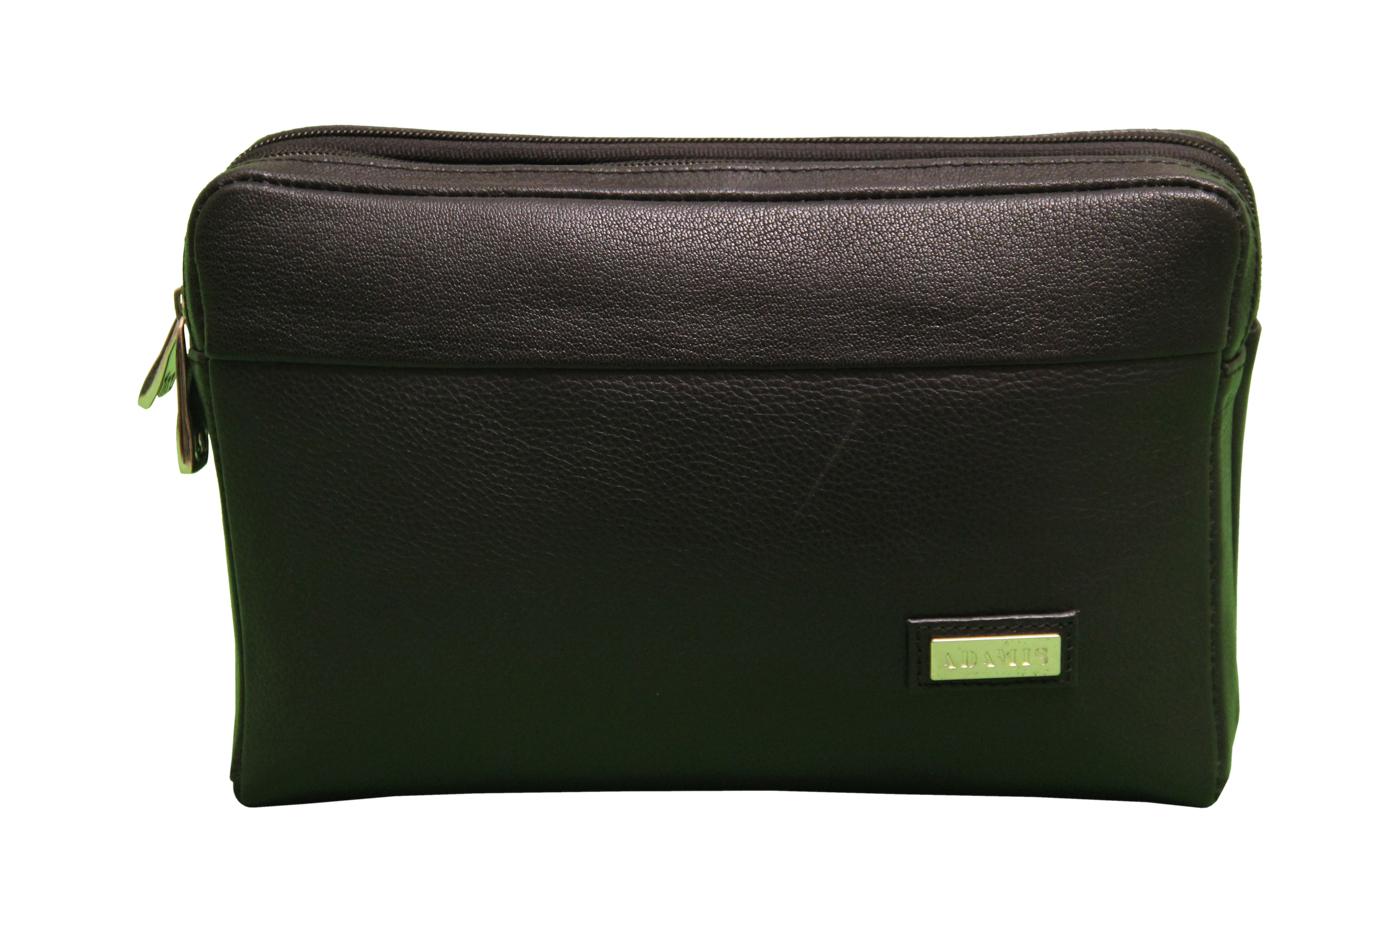 P20-Fernando-Men's bag cum travel pouch in Genuine Leather - Black